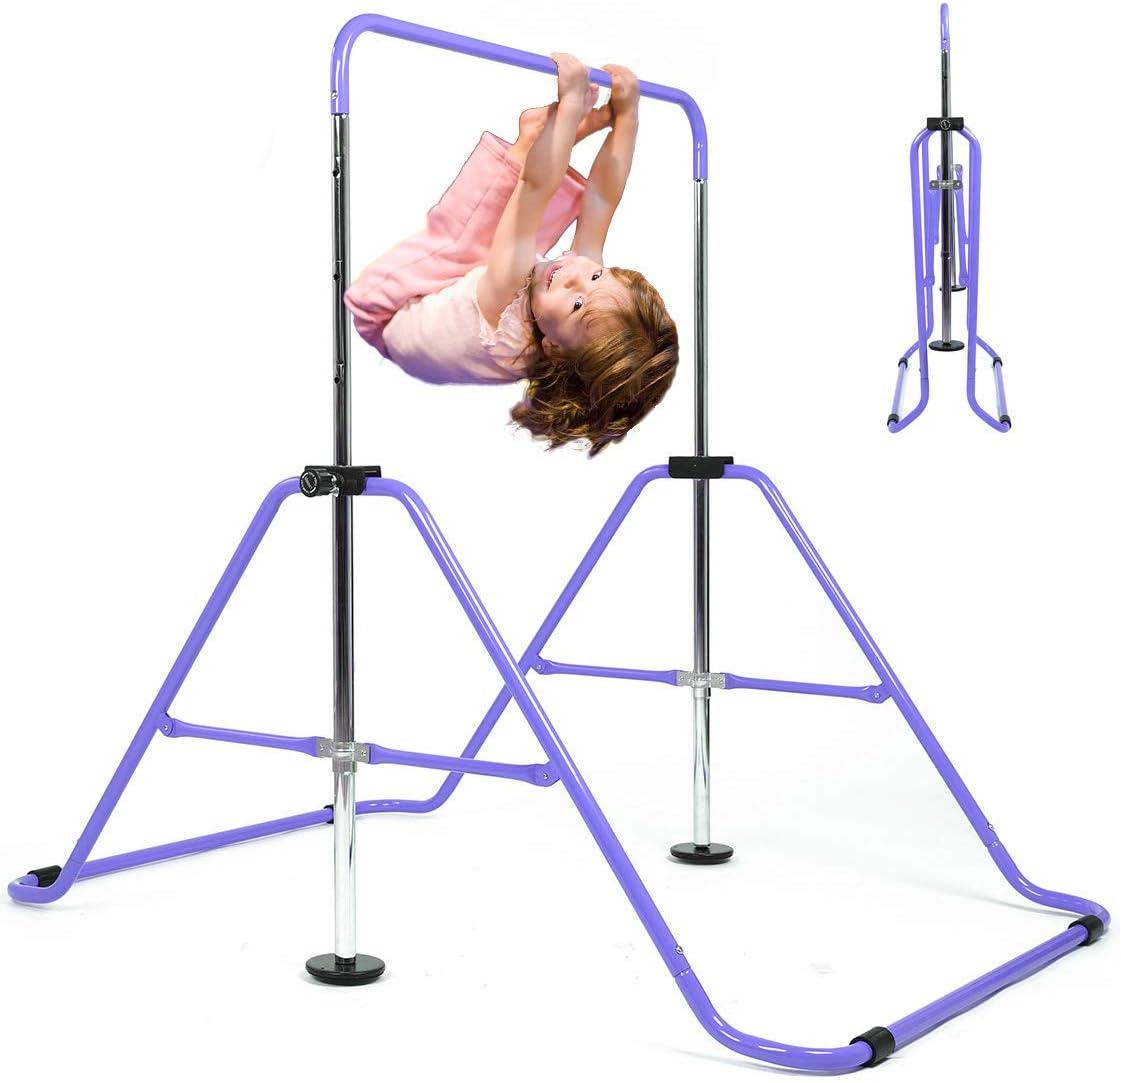 My Quality Life Gymnastics Bar Kids Expandable Gymnastic Bars Equipment for Home Adjustable Height Folding Kip Junior Training Bar 3-7 Years Old